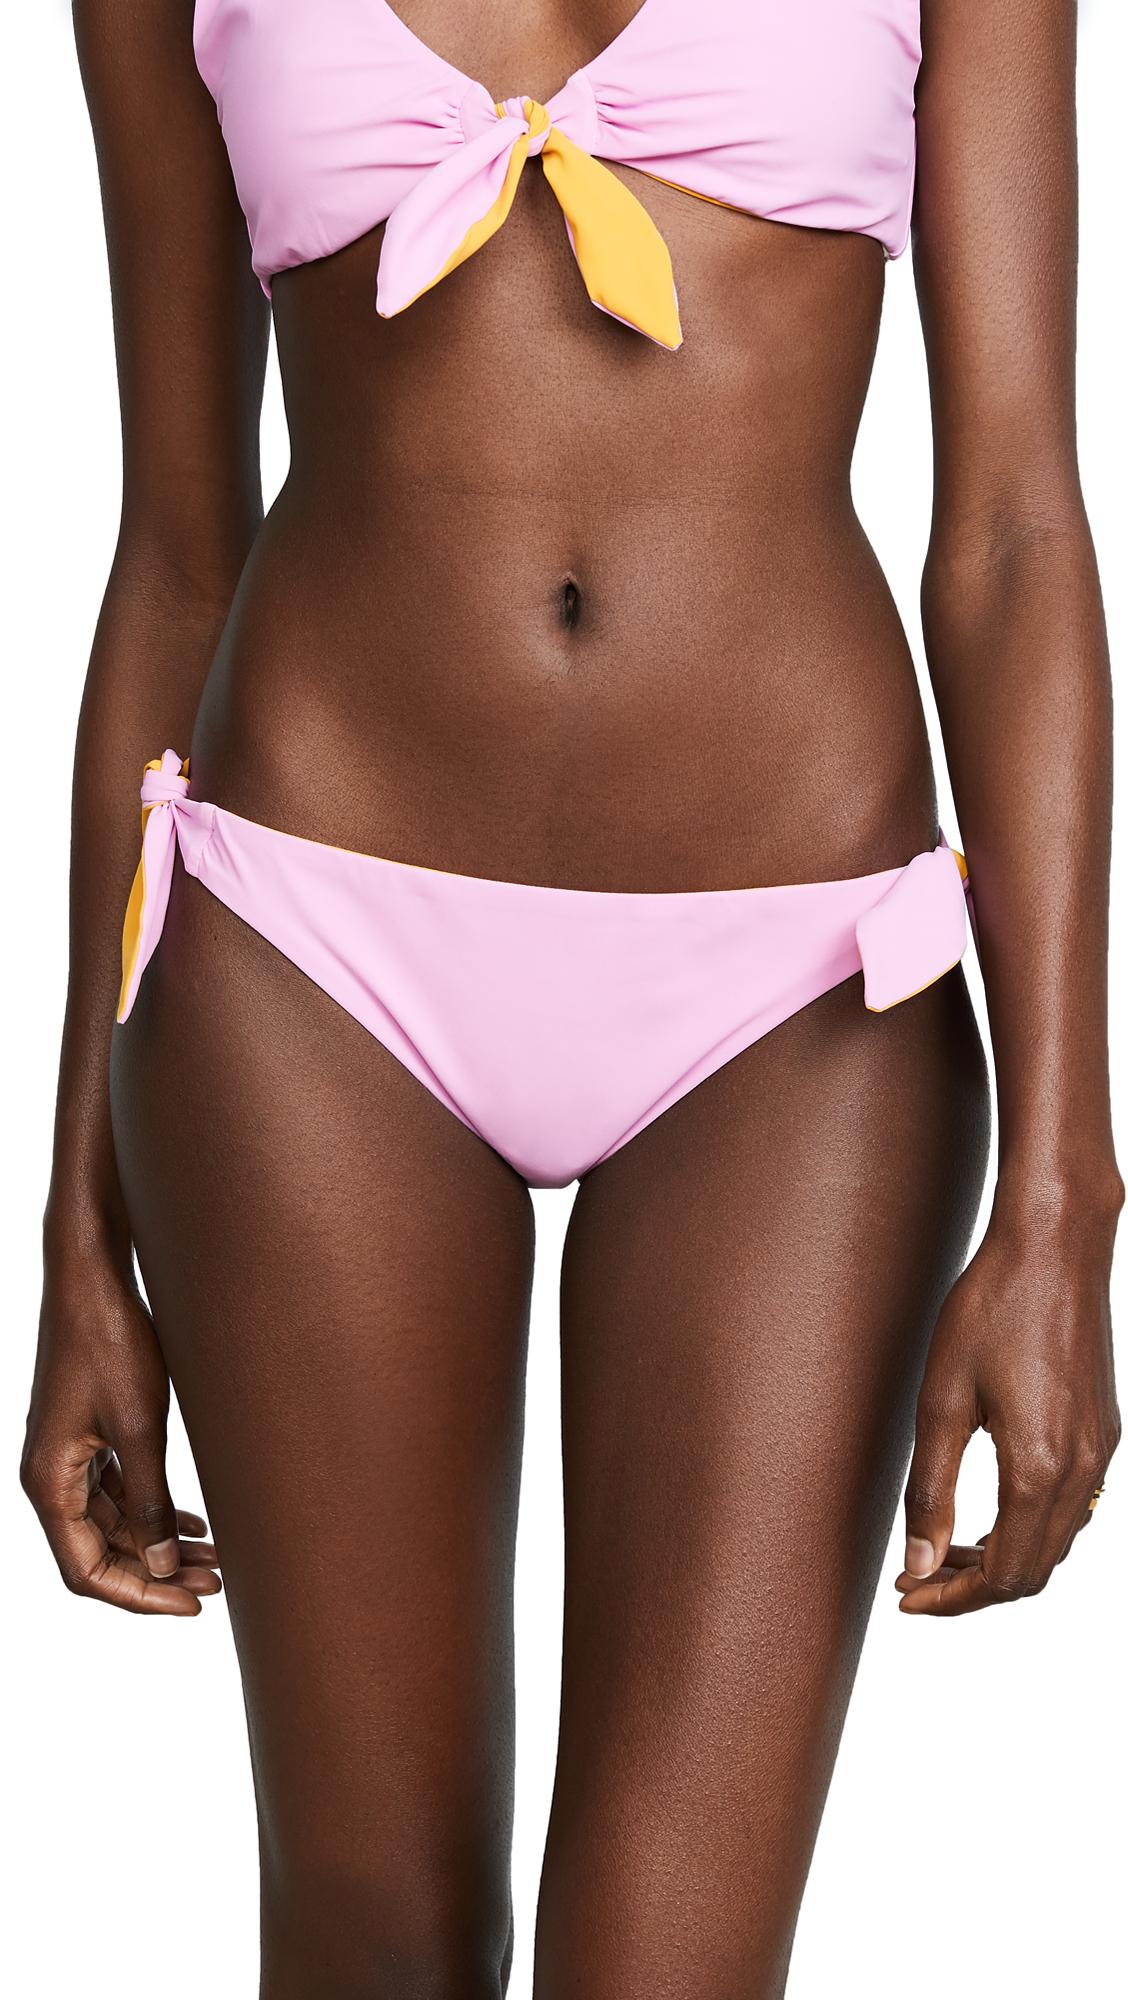 Tory Burch Biarritz Reversible Bikini Bottoms In Pink/Orange